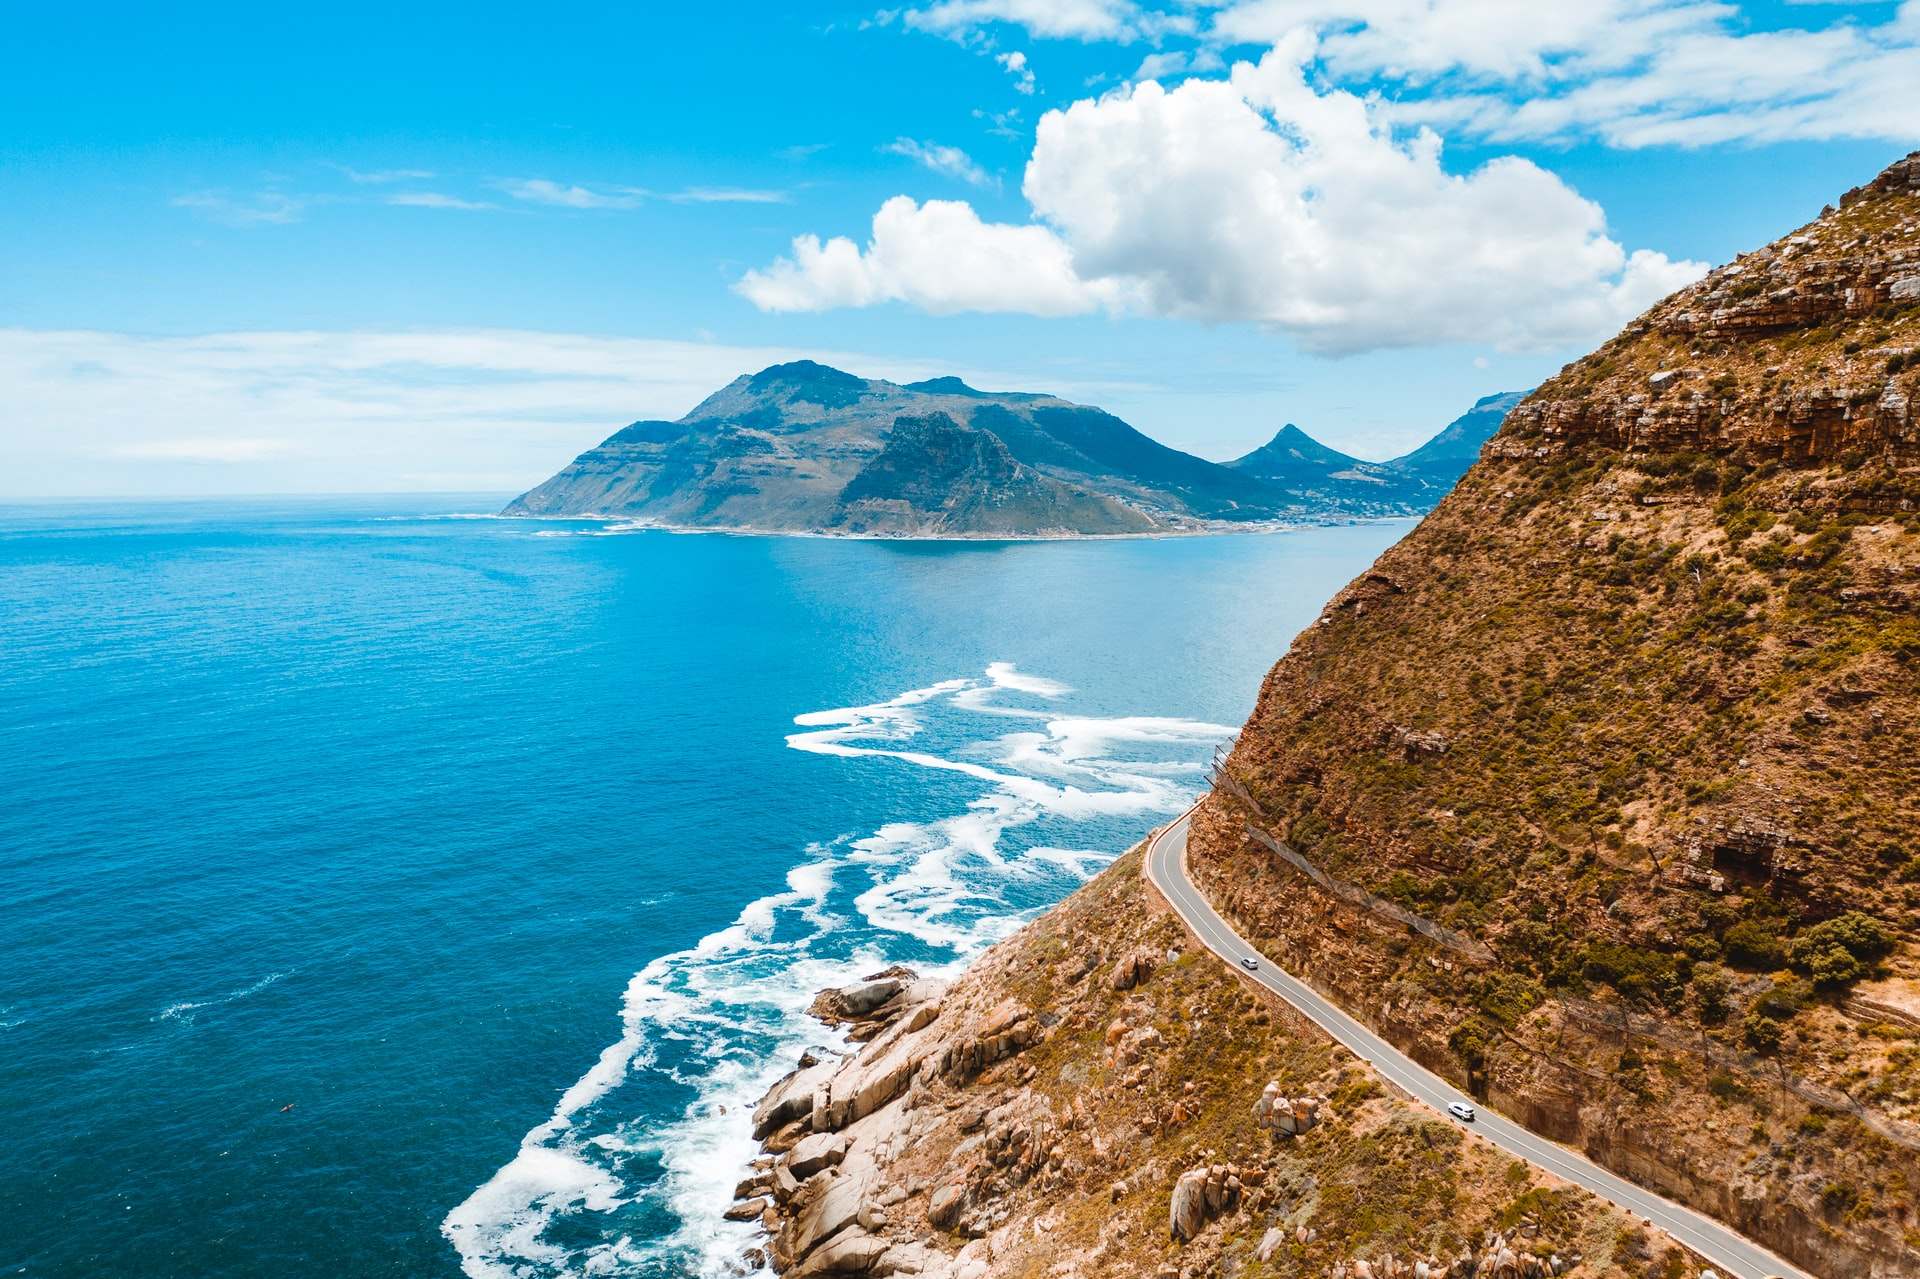 Chapmans peak South Africa